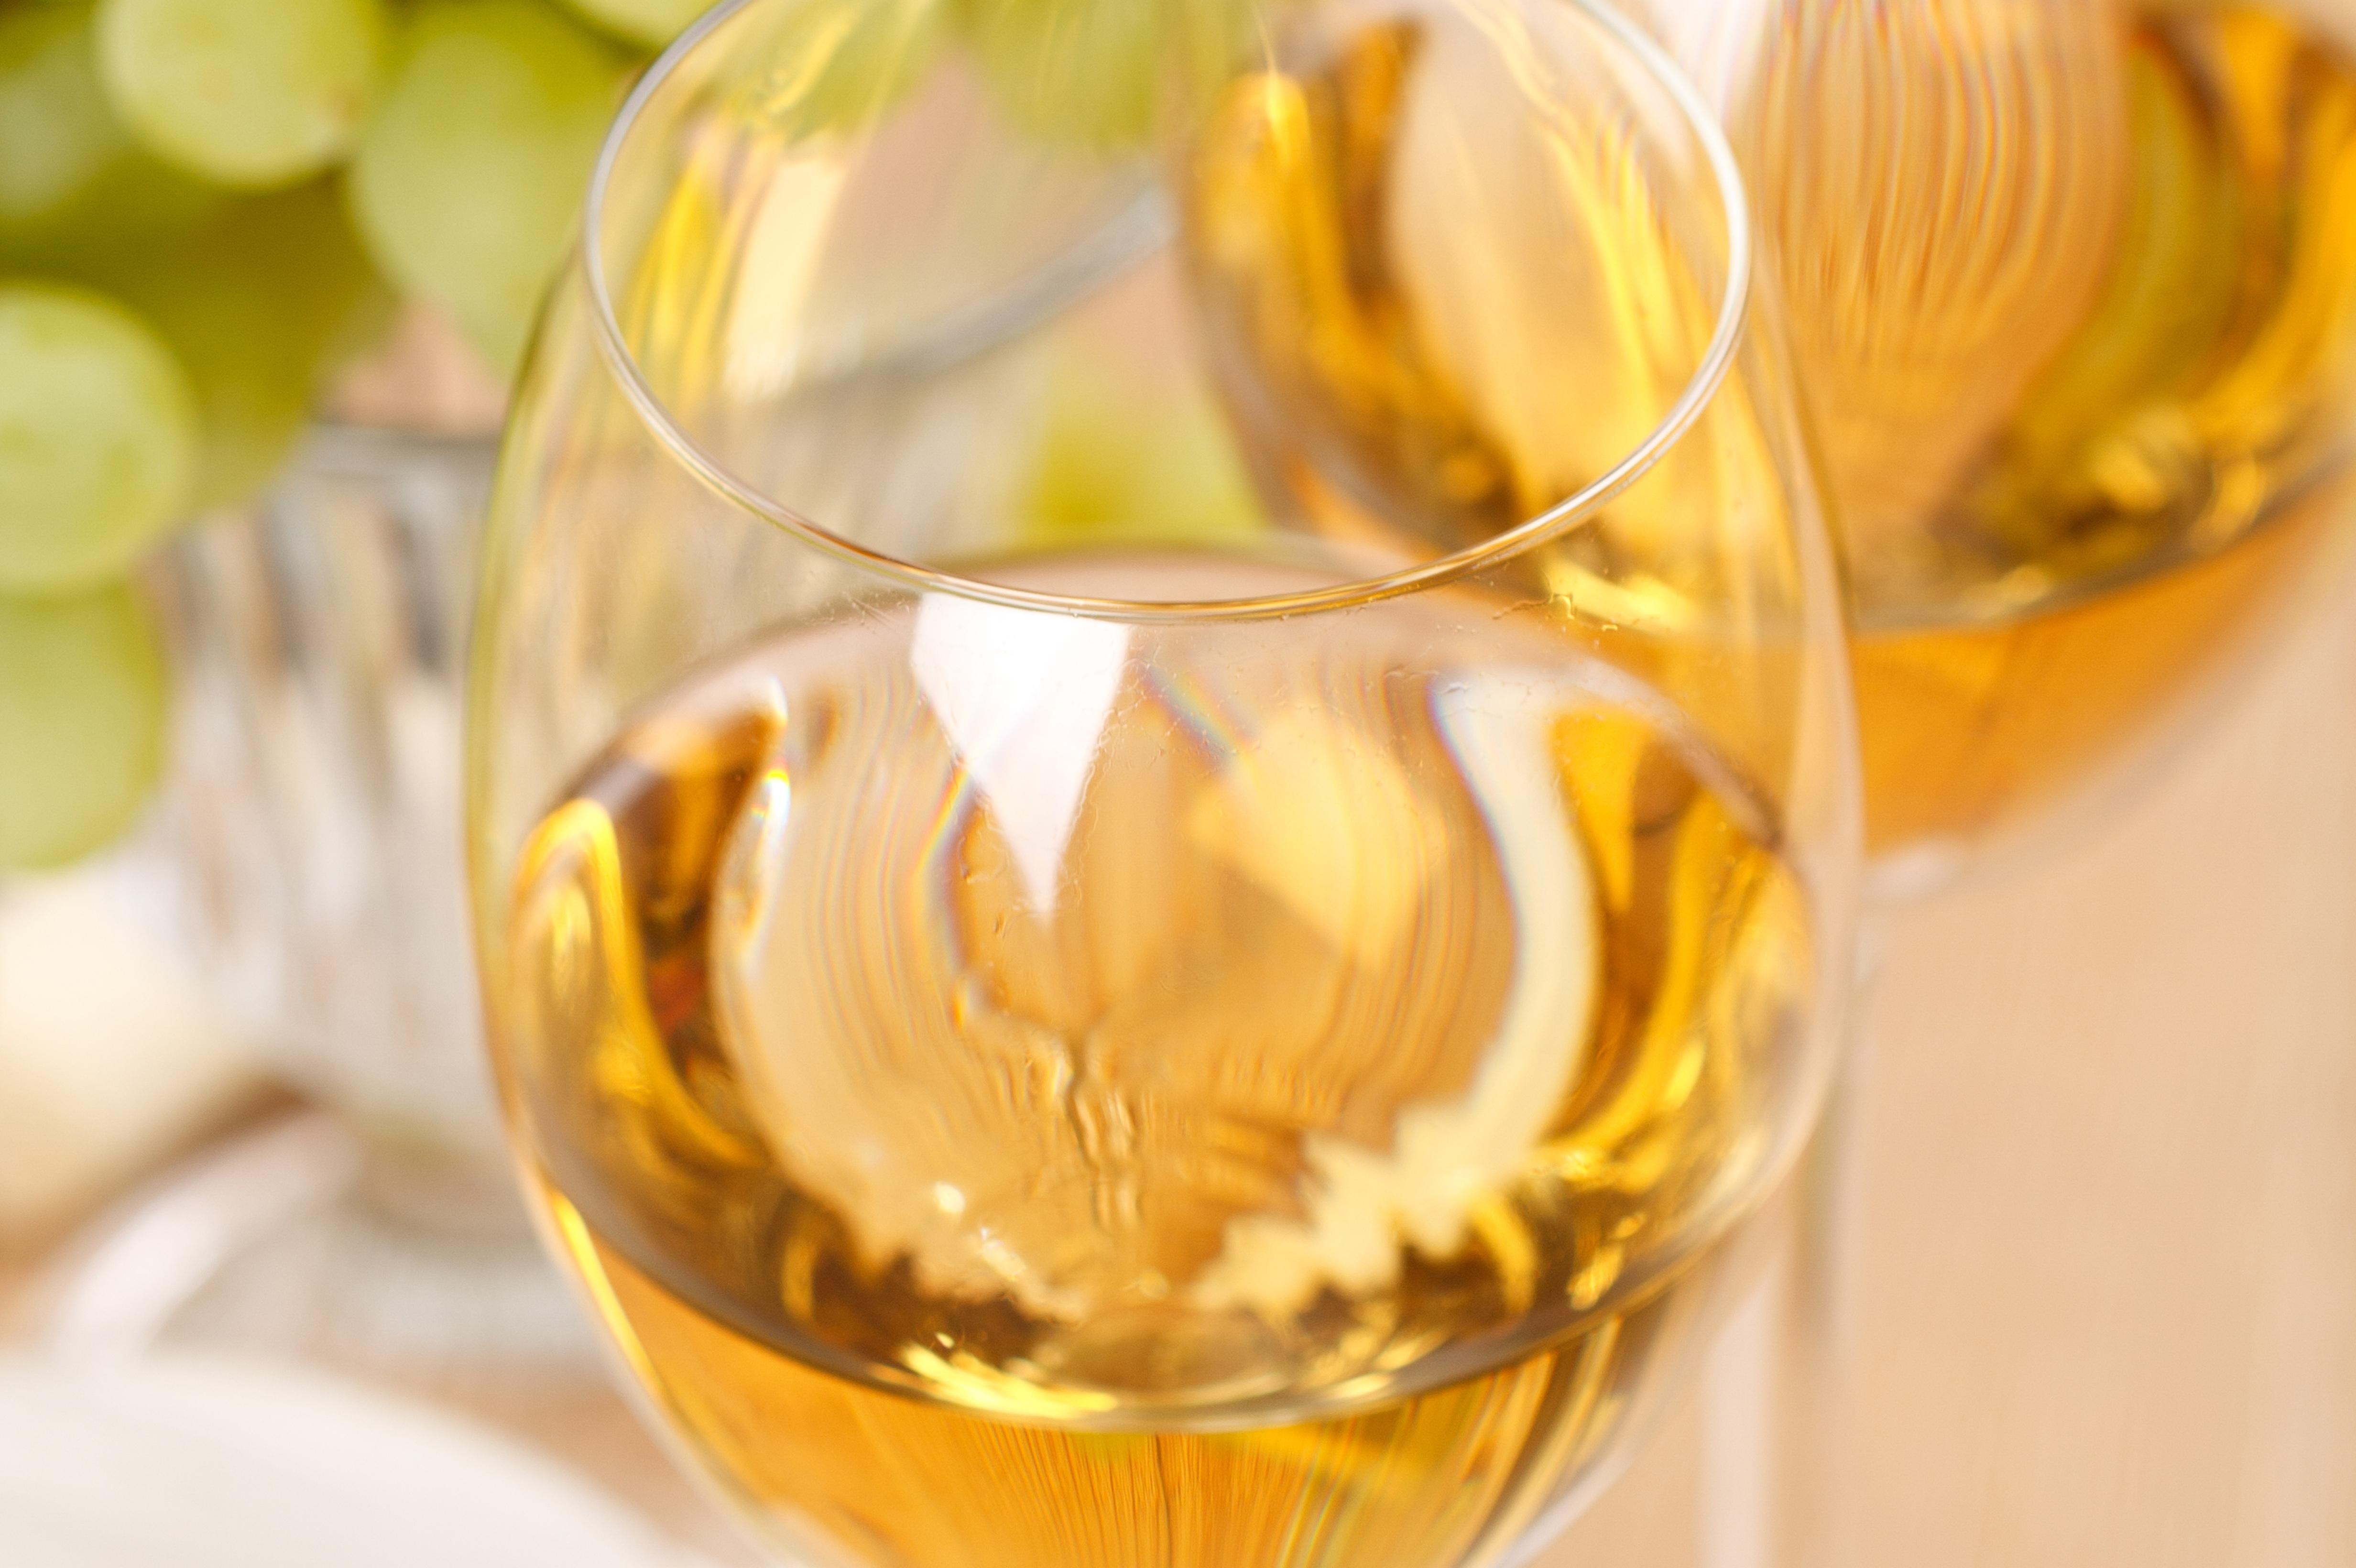 La feria del vino a granel ya tiene fechas